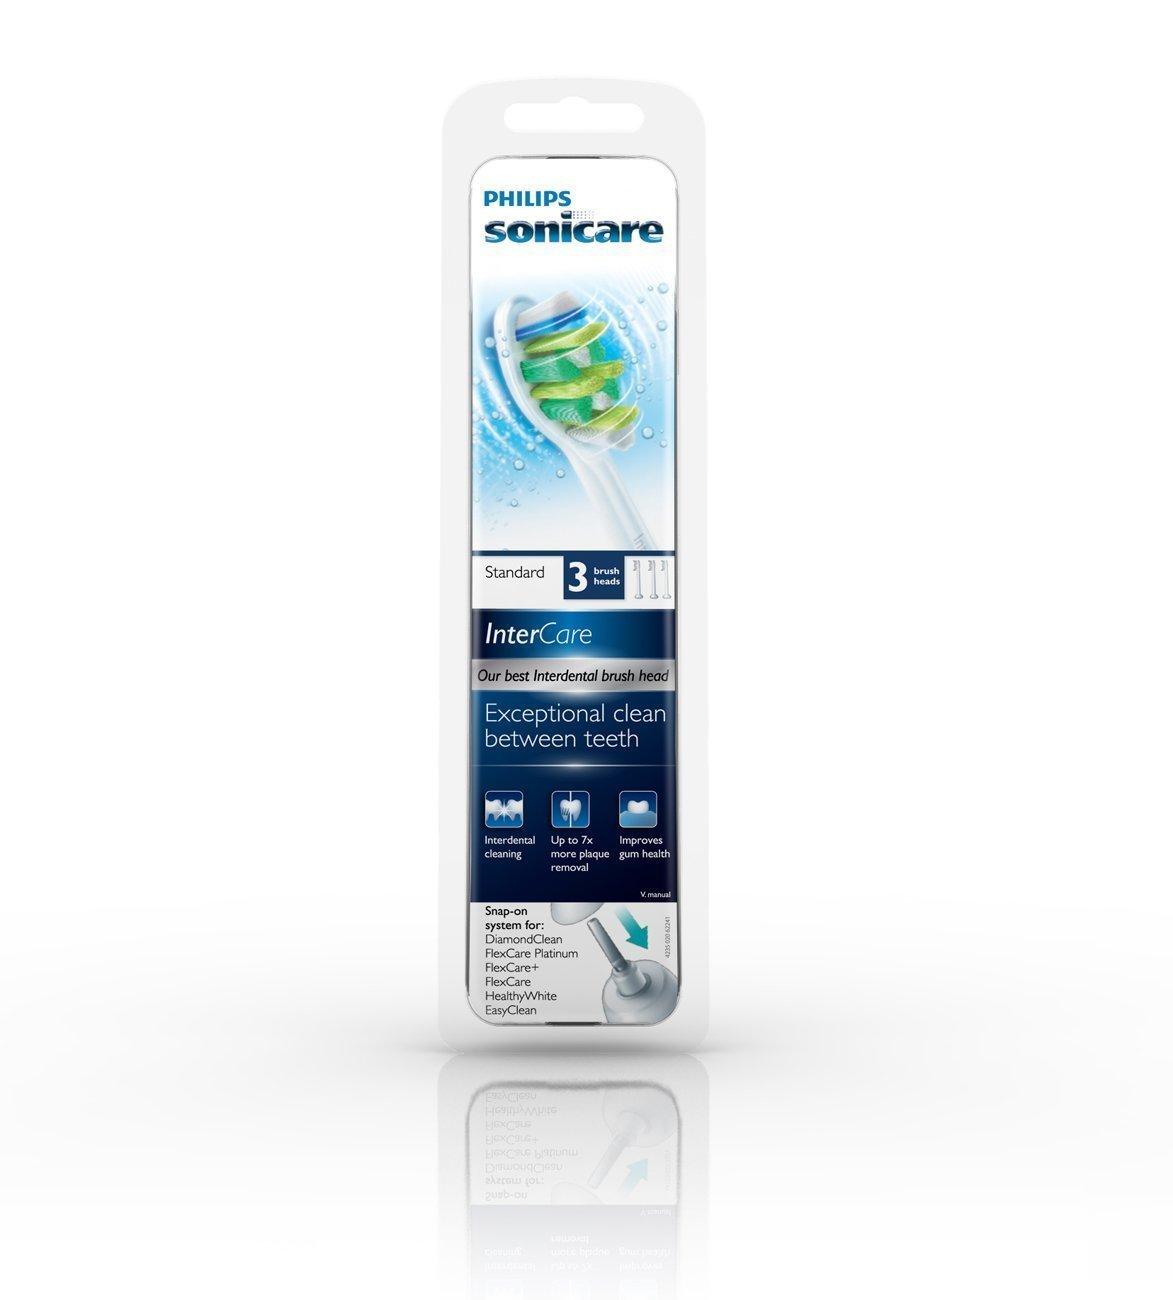 Philips Sonicare Flexcare Platinum Standard Brush head HX9003/64, 3-pk InterCare replacement toothbrush heads